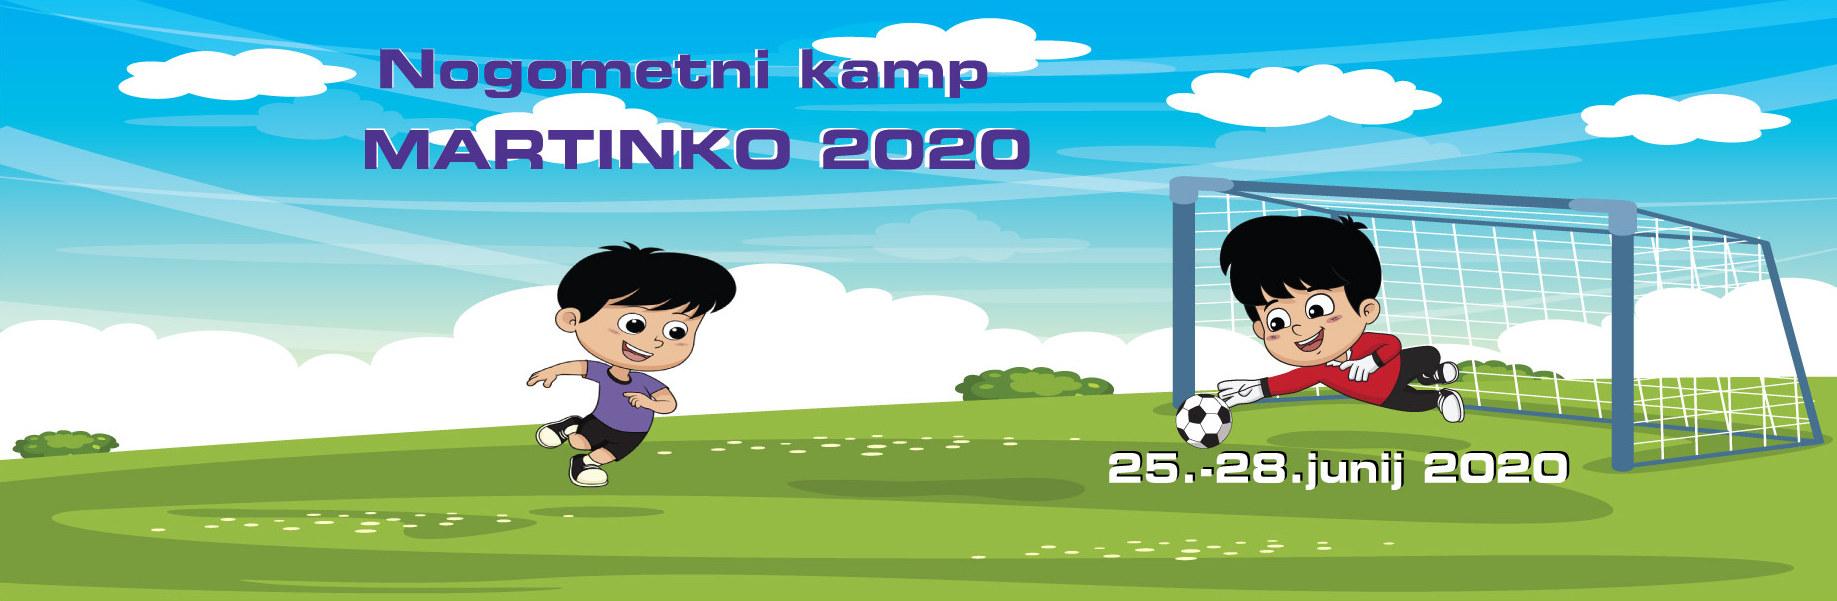 Martniko-2020-web3